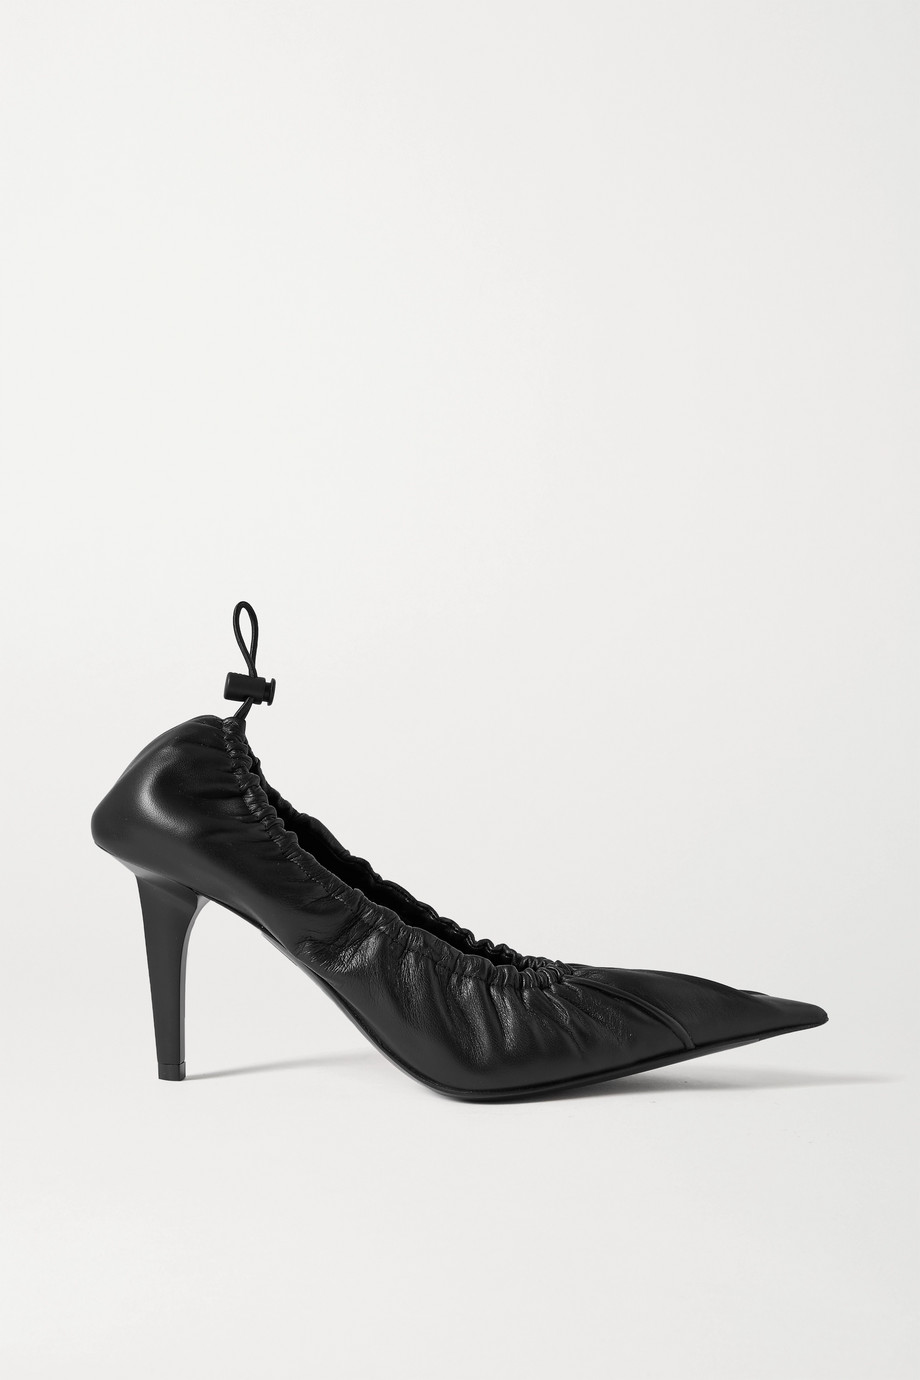 Balenciaga Scrunch Knife ruched leather pumps